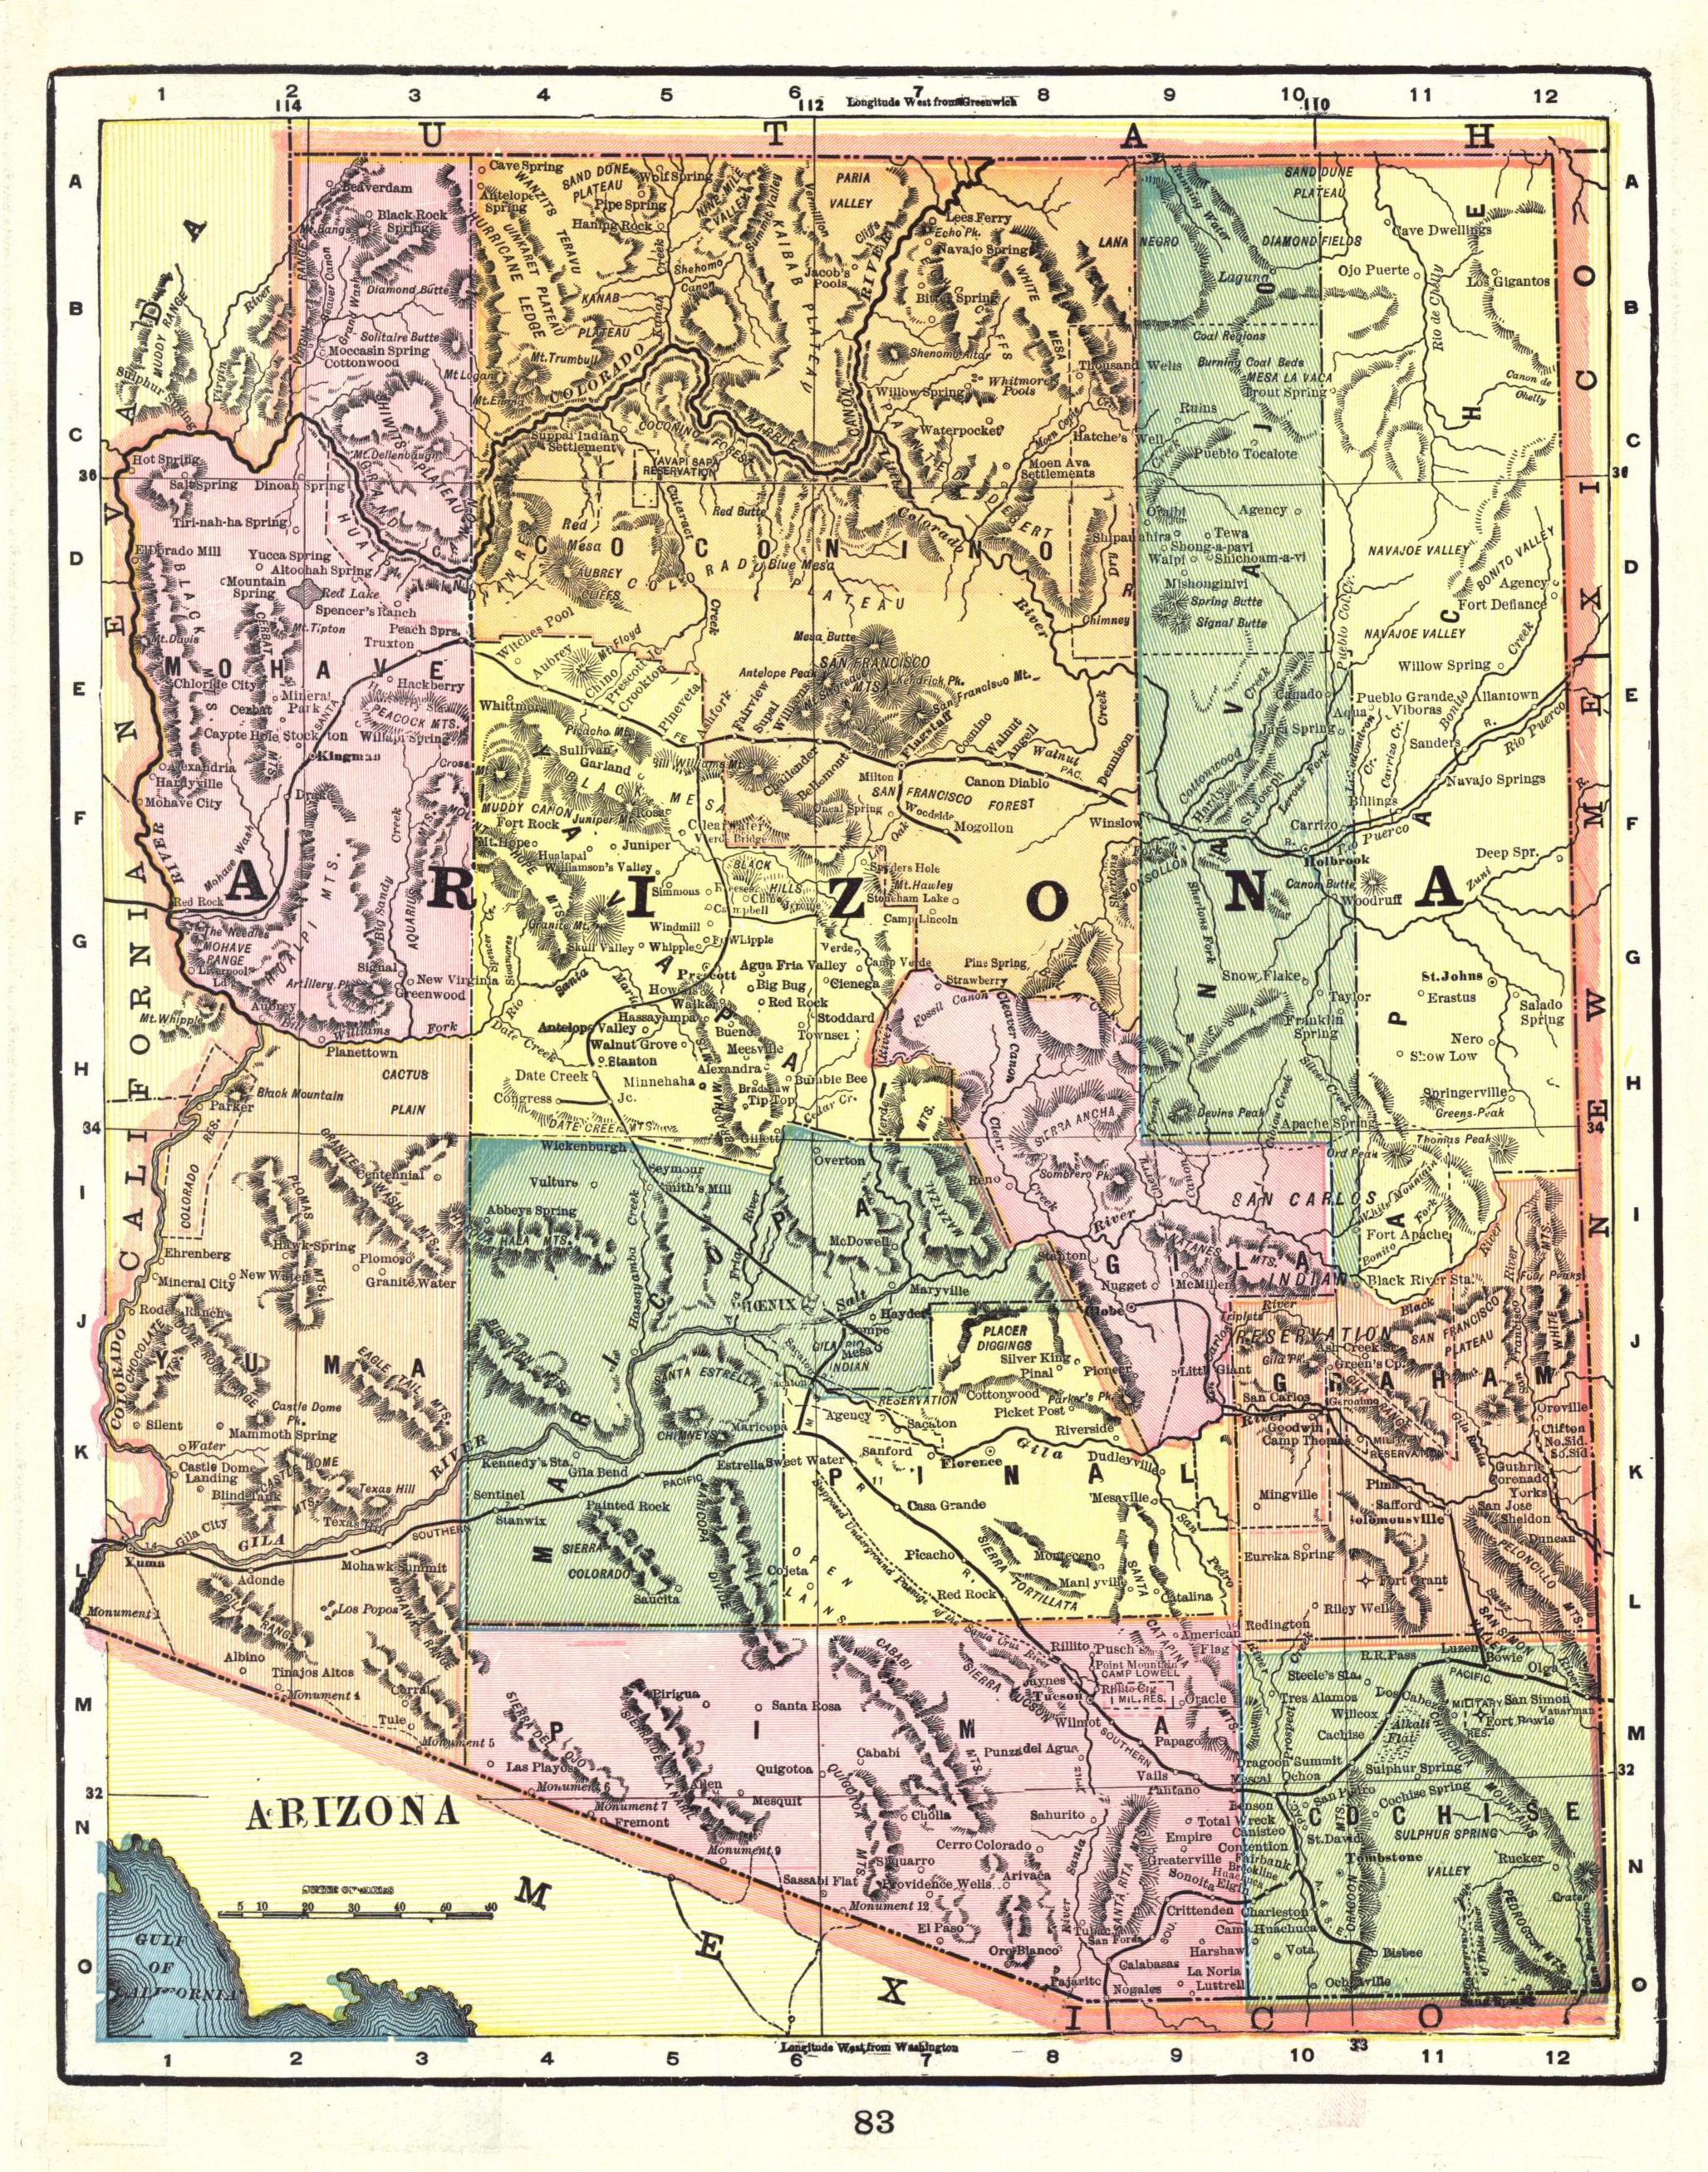 File:Arizona Territory Map, 1898, 2.jpg - Wikimedia Commons